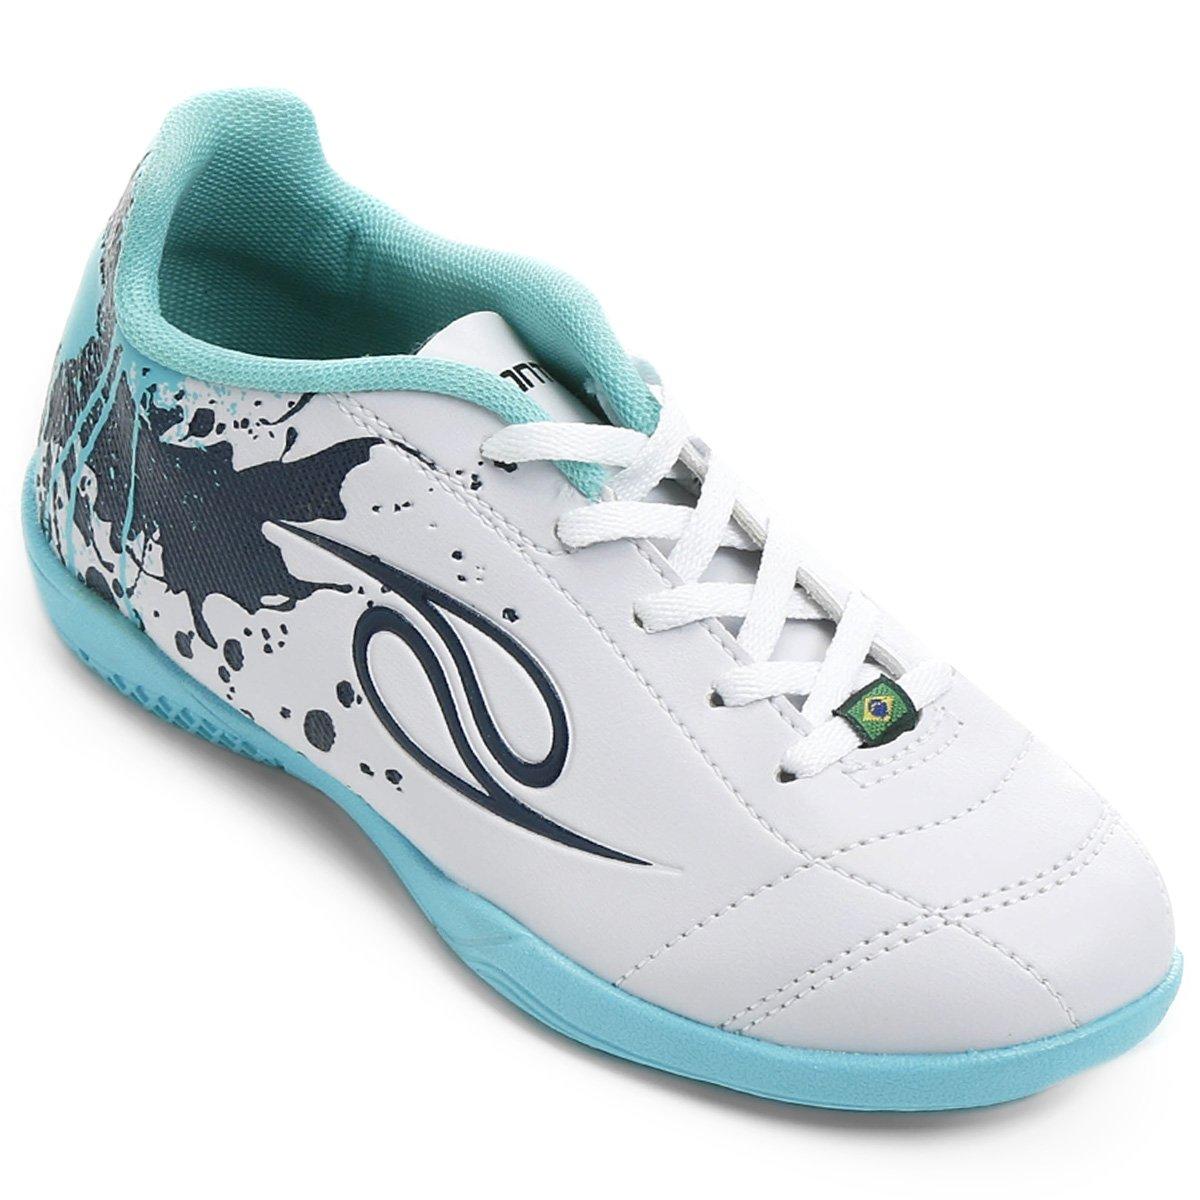 Chuteira Futsal Infantil Dalponte Contact - Compre Agora  1b60436a33e30